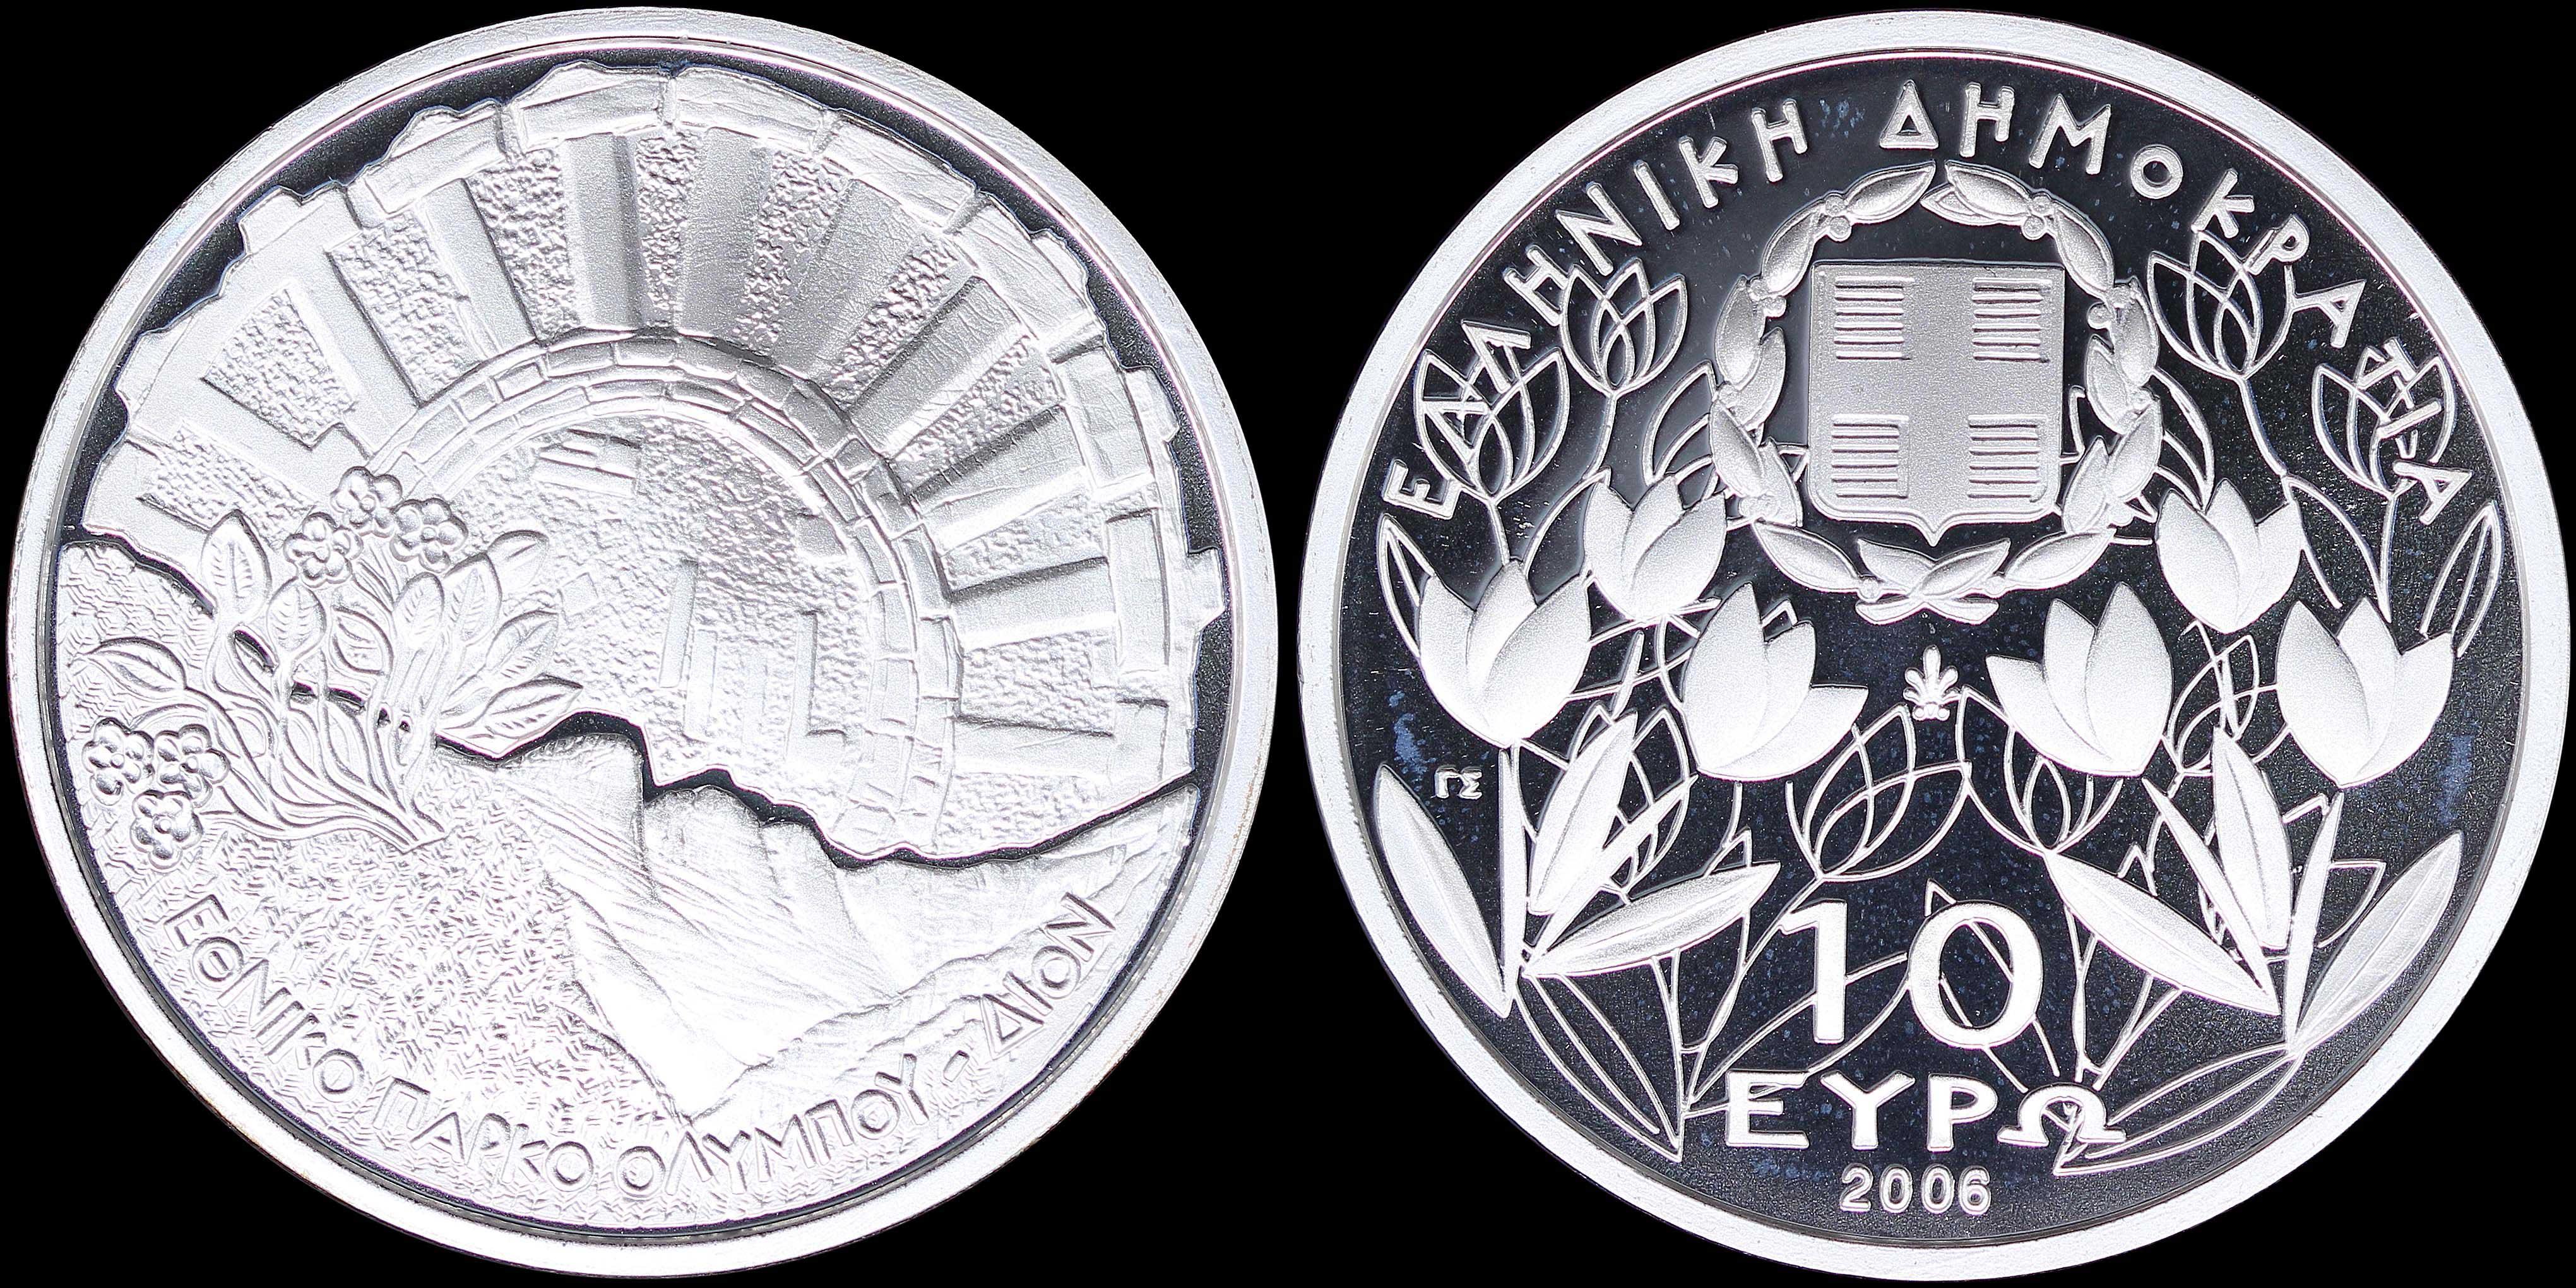 Lot 6250 - -  COINS & TOKENS HELLENIC REPUBLIC & COMMEMORATIVE ISSUES -  A. Karamitsos Public & Live Internet Auction 682 (Part A) Coins, Medals & Banknotes